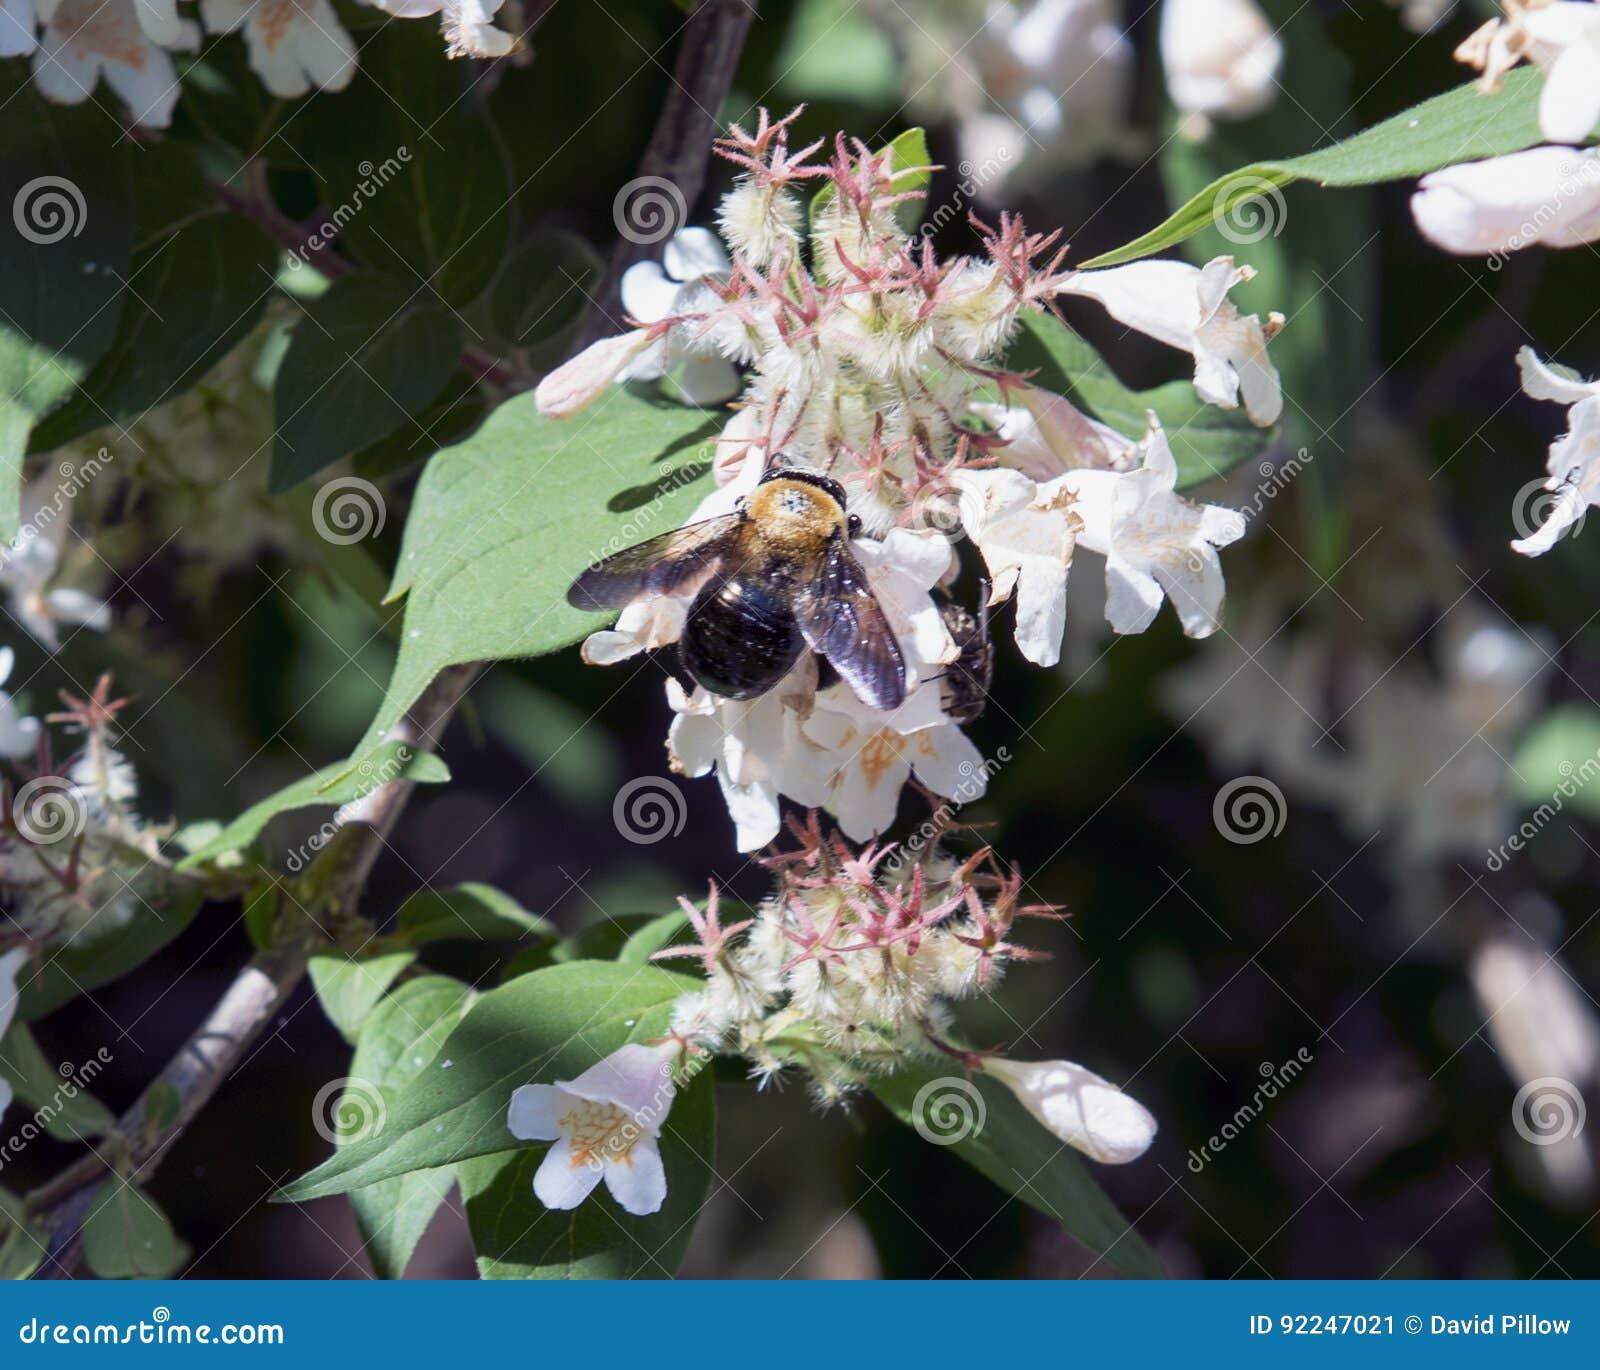 Bumblebee gathering nectar from honeysuckle